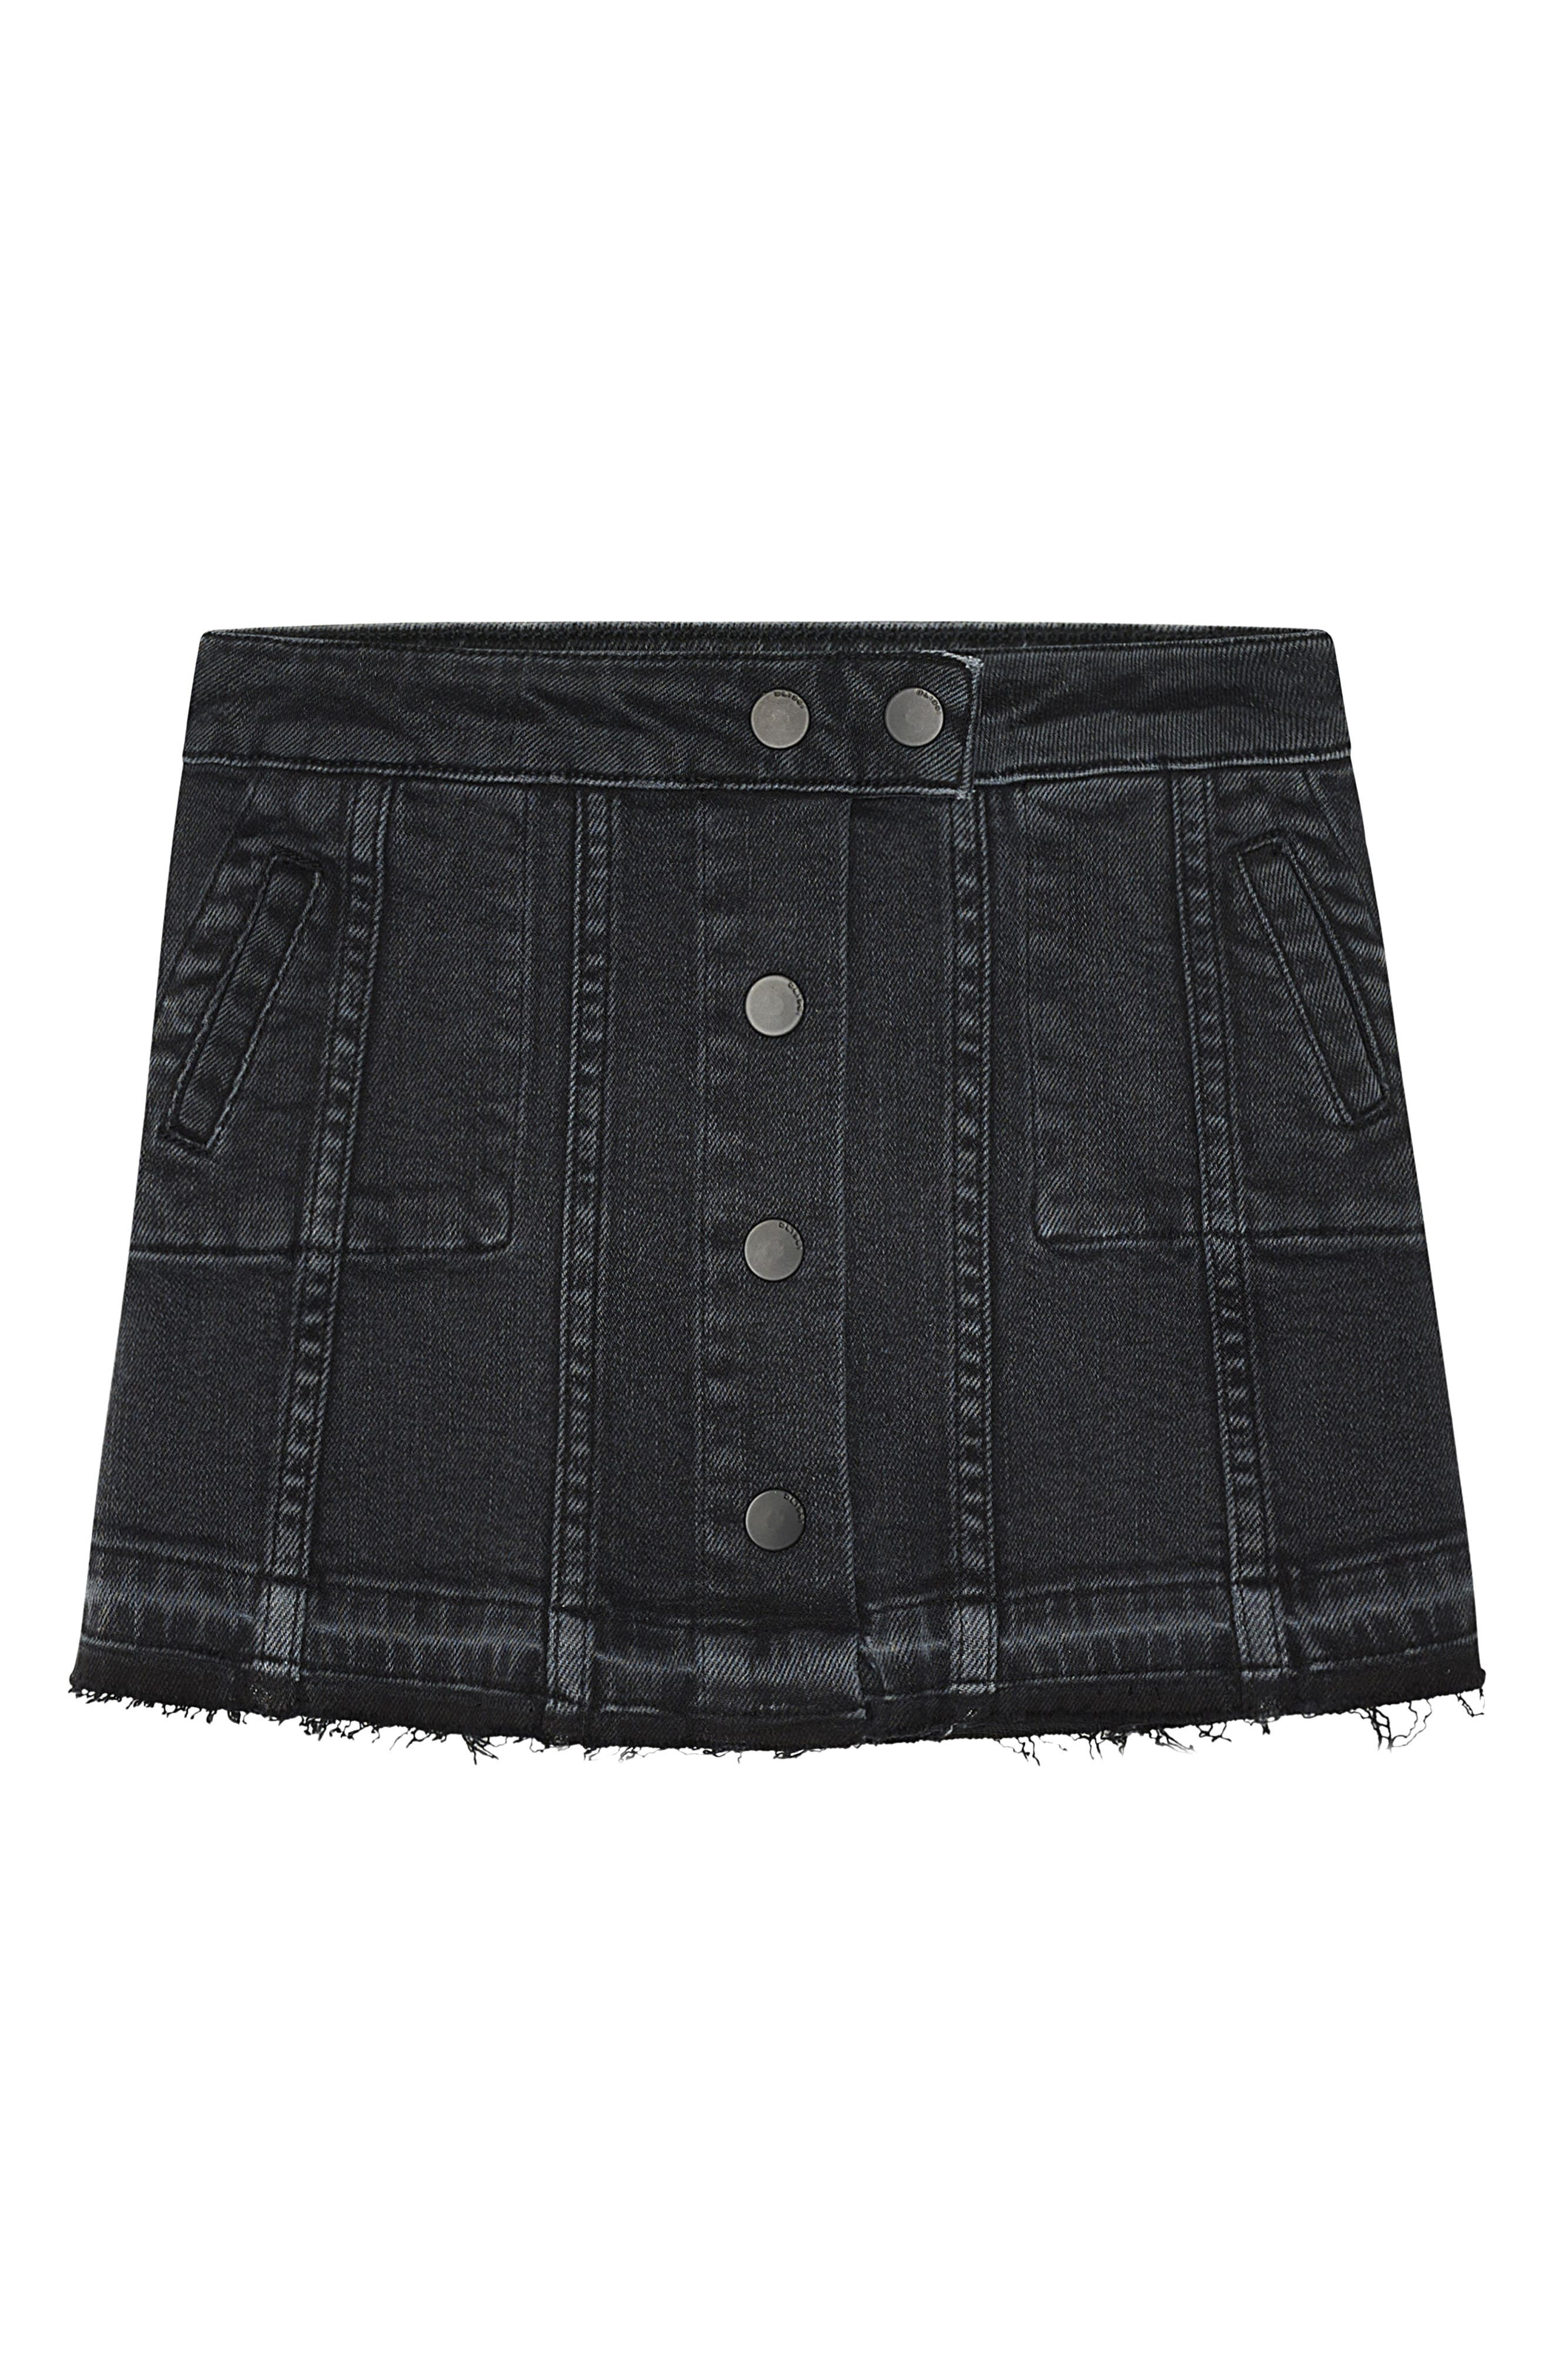 Jenny Cutoff Denim Skirt,                             Main thumbnail 1, color,                             Lightning